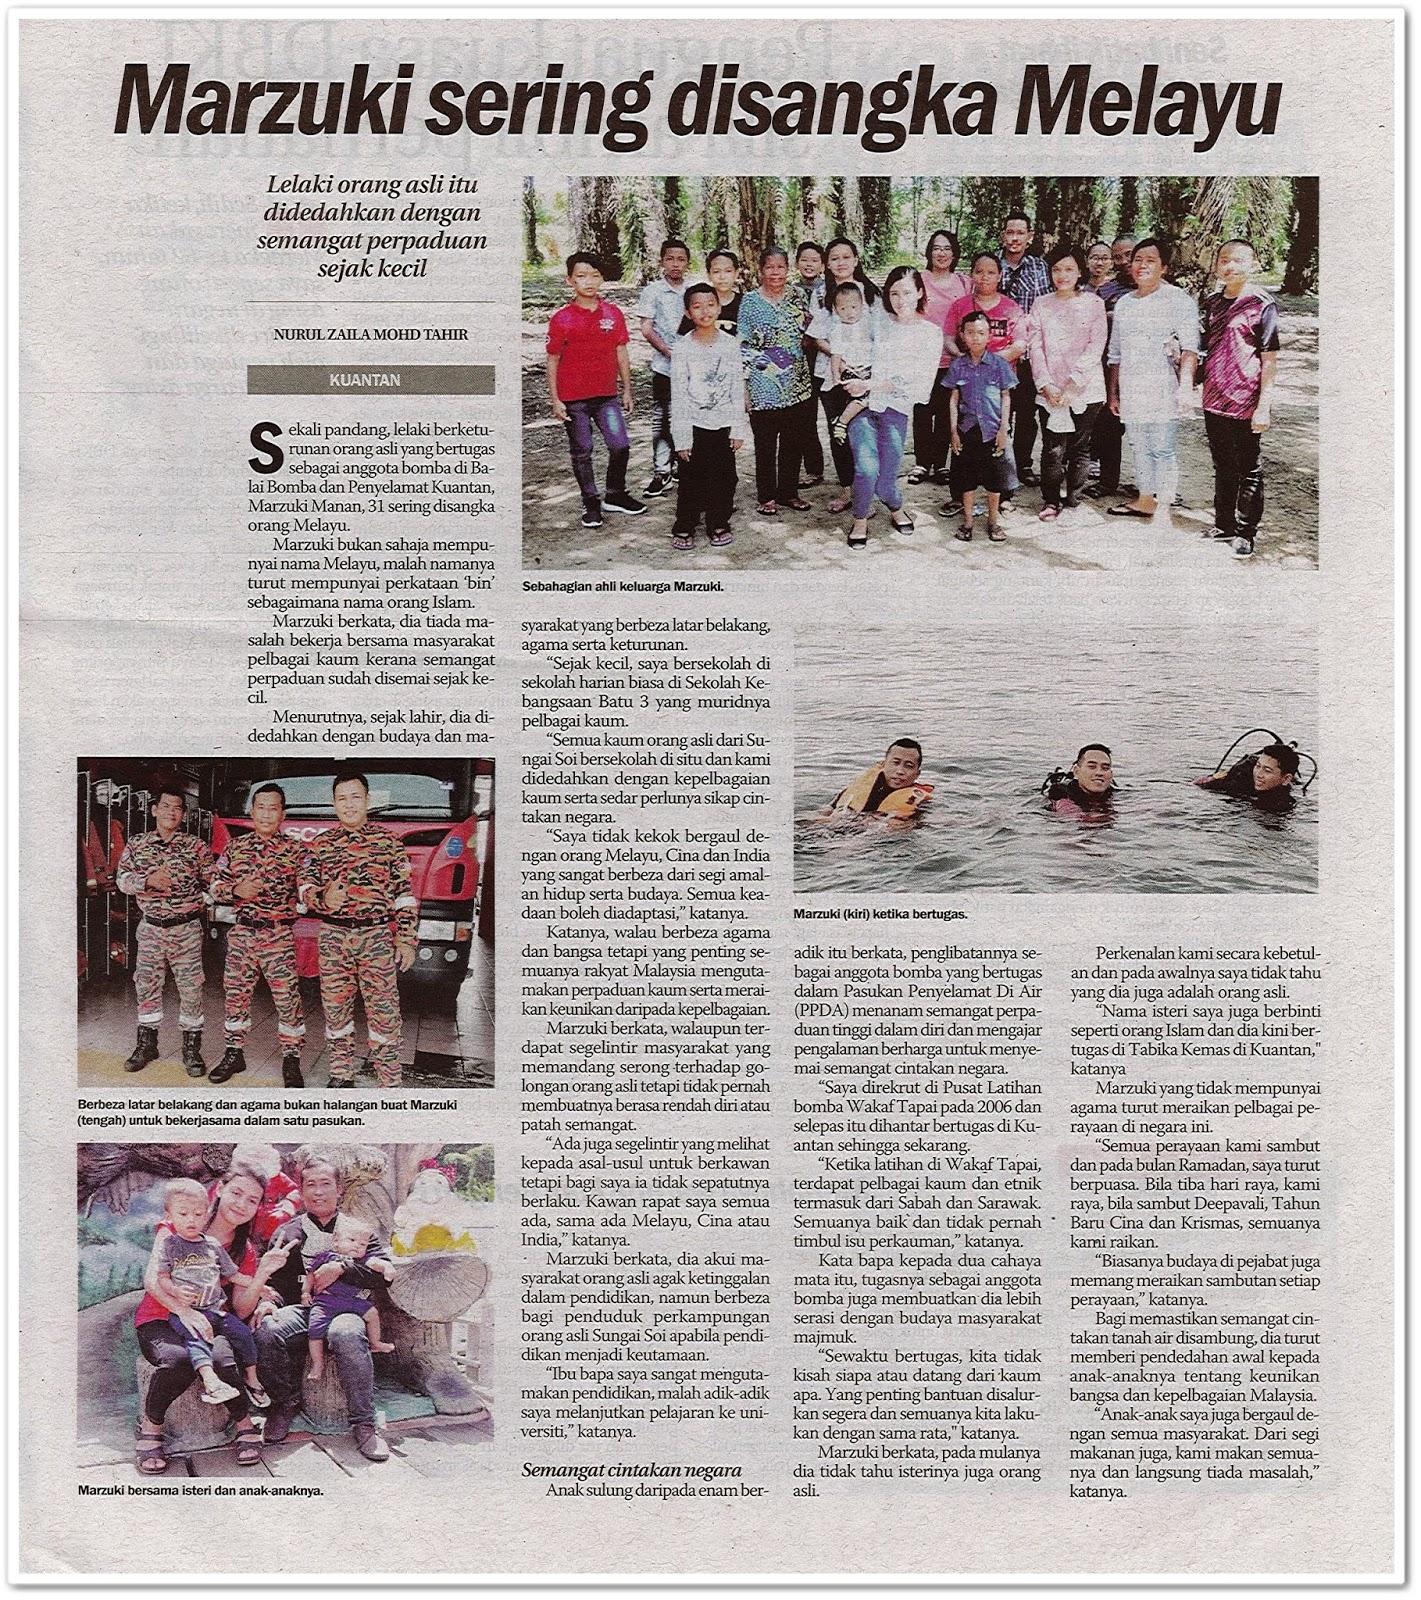 Marzuki sering disangka Melayu - Keratan akhbar Sinar Harian 12 September 2019